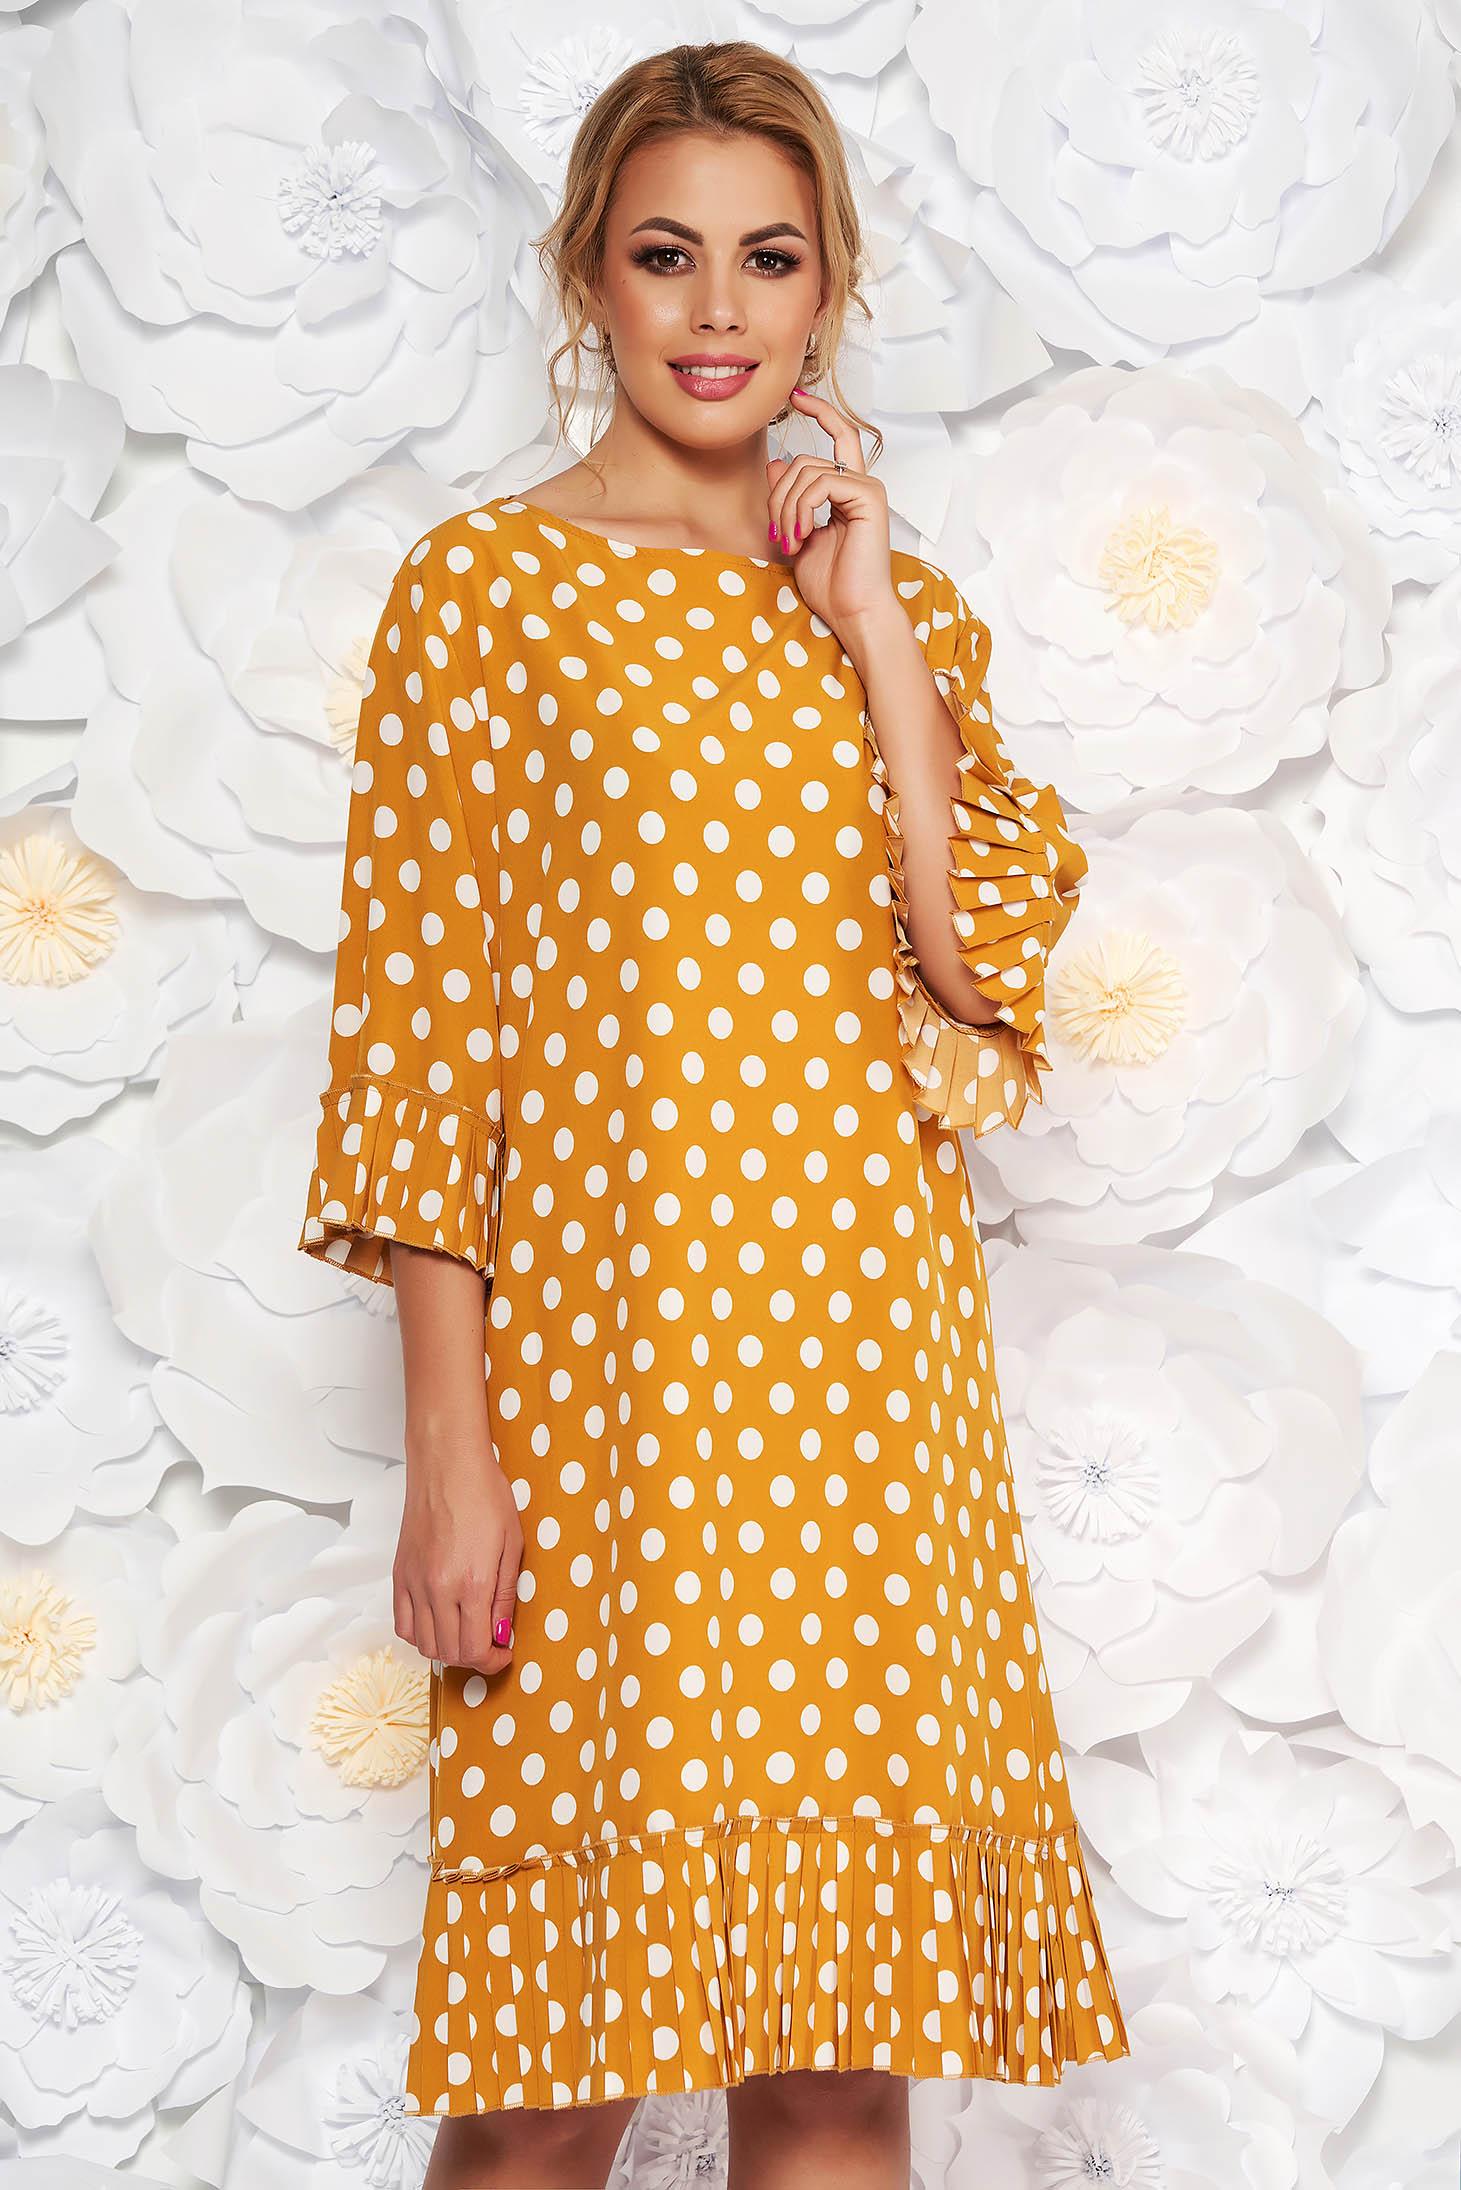 Rochie mustarie de zi cu croi larg cu maneci clopot din material subtire cu buline